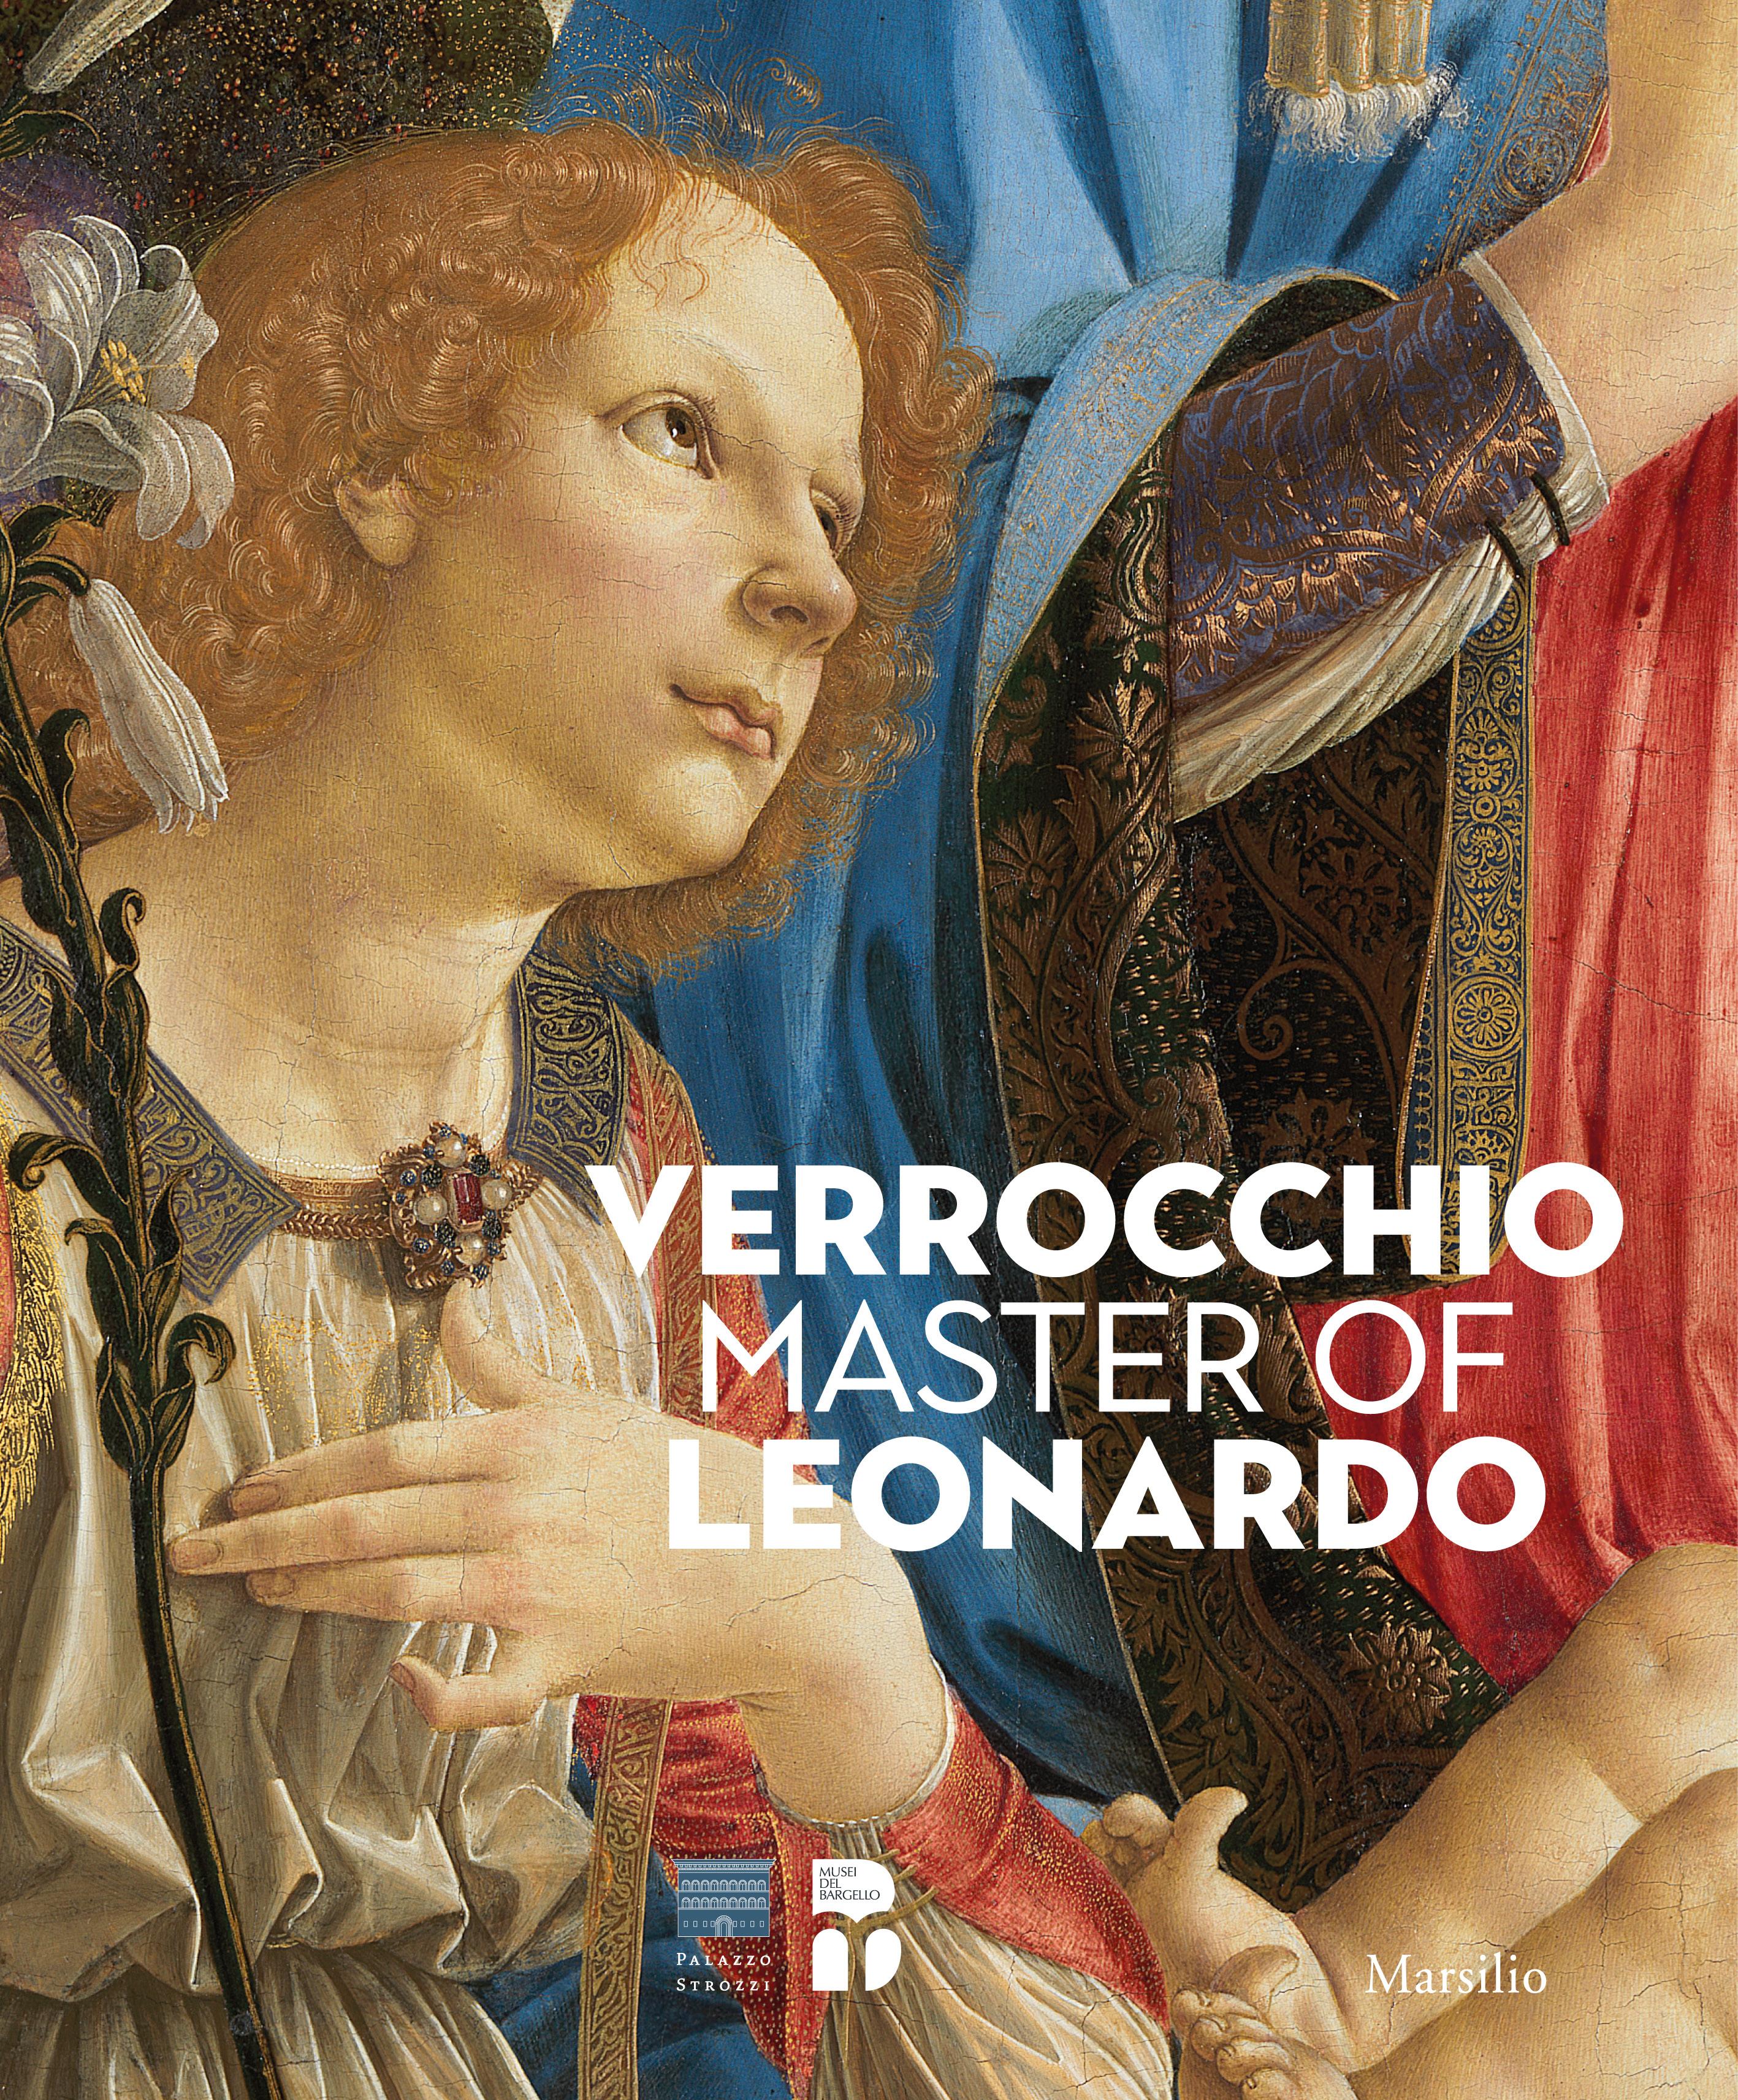 Verrocchio, Master of Leonardo